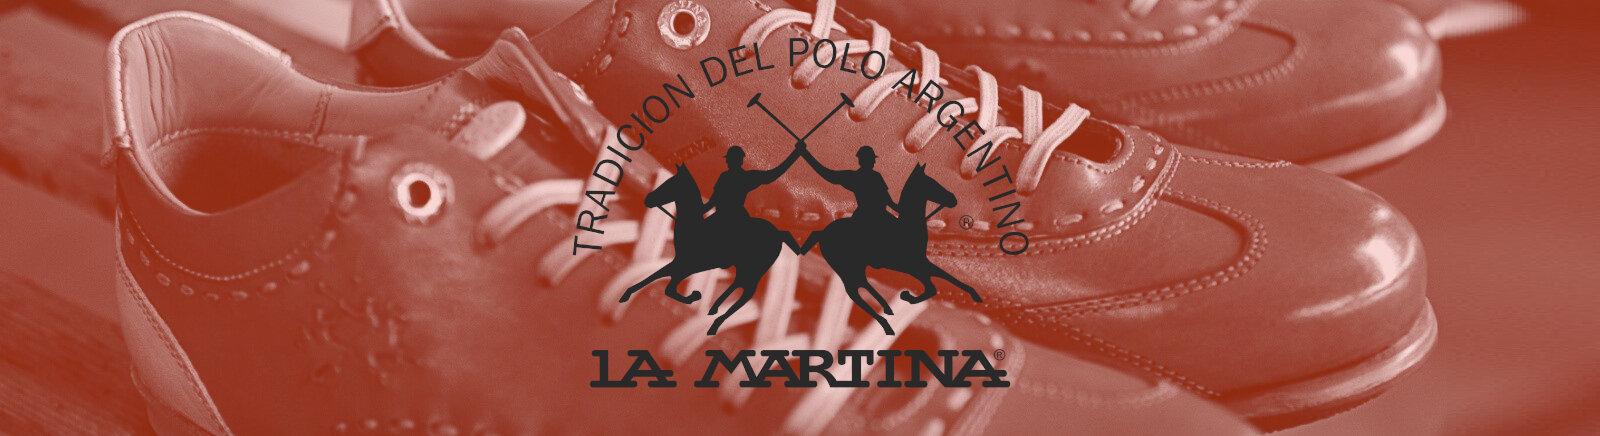 La Martina Herrenschuhe online entdecken im Juppen Schuhe Shop